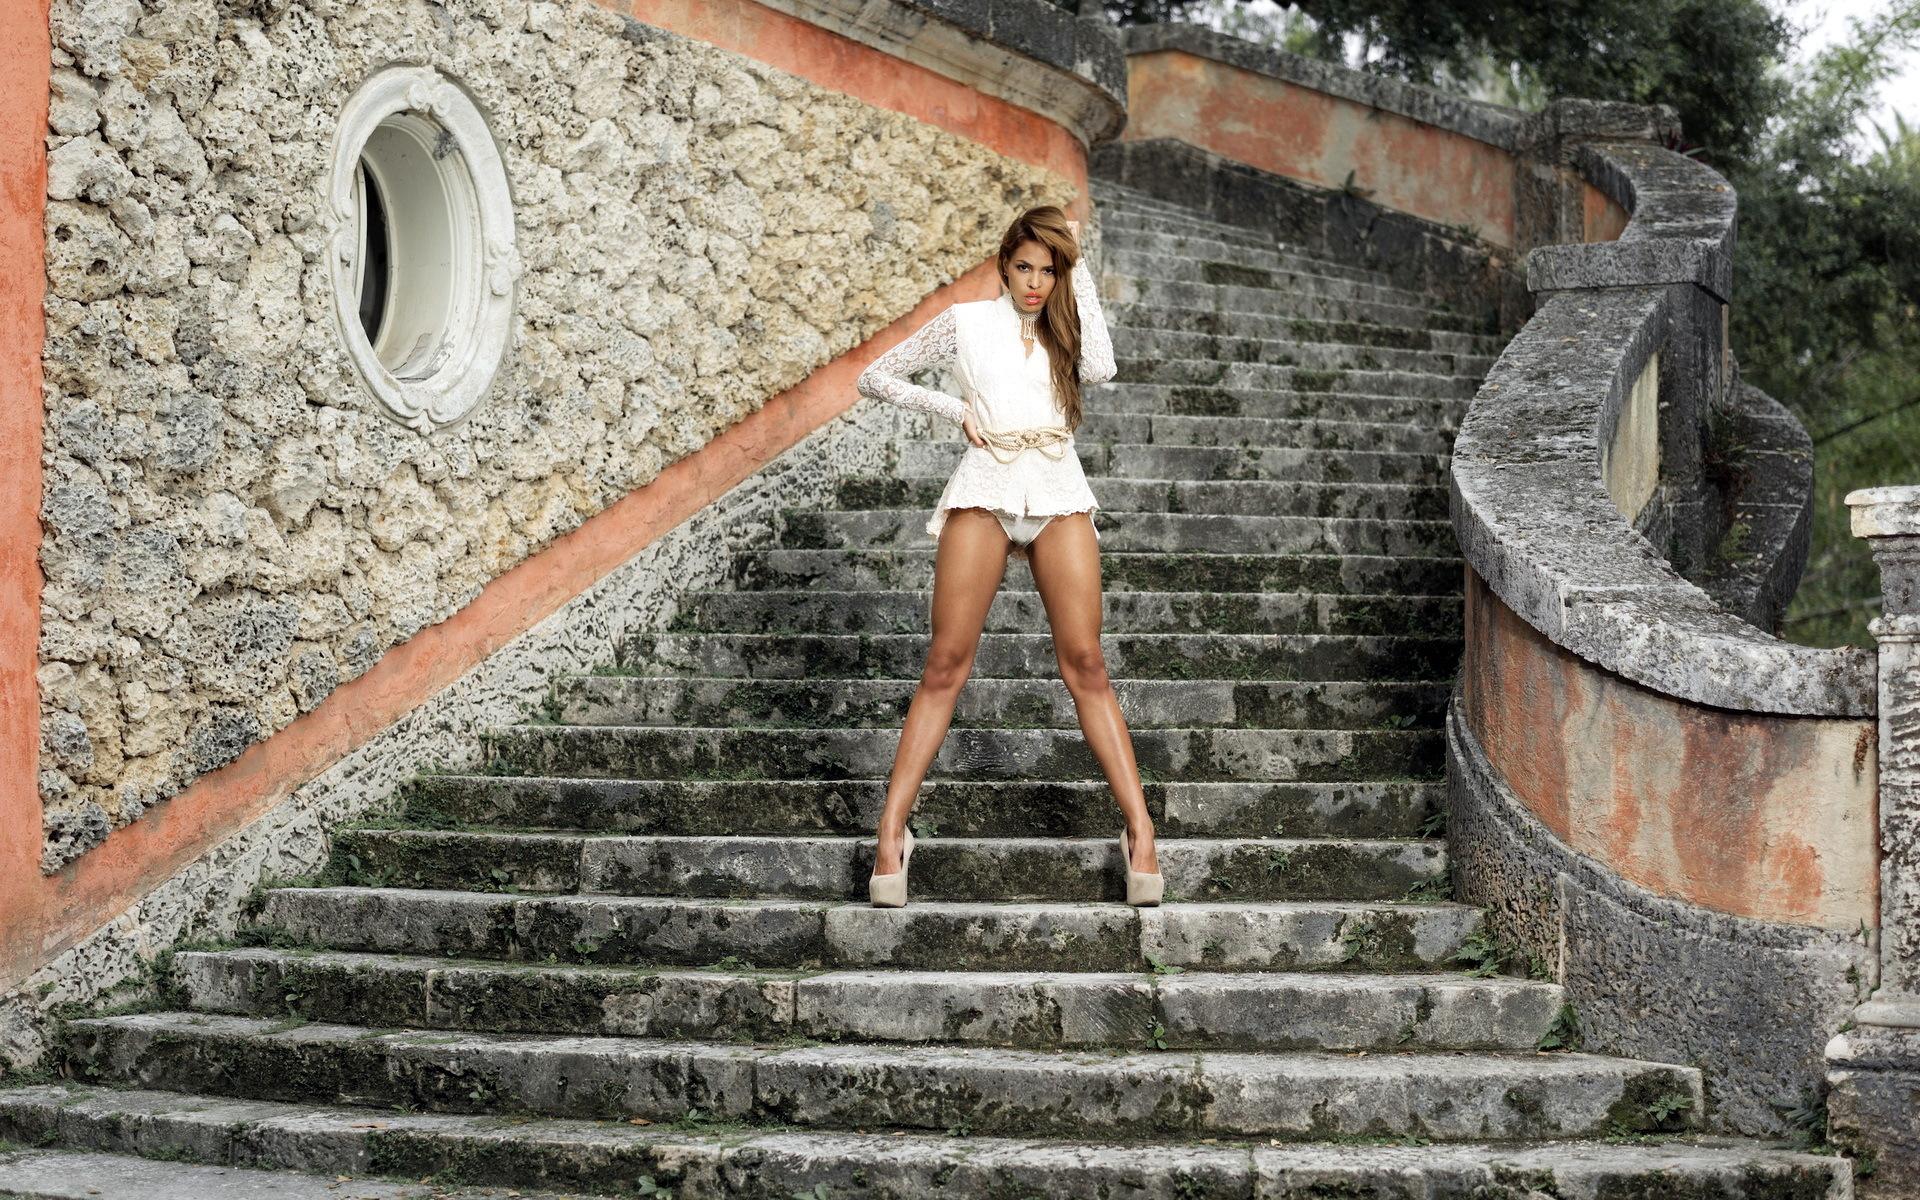 Трахает на лестнице, трахнул на лестнице порно видео и фото на ПростоПорно 12 фотография